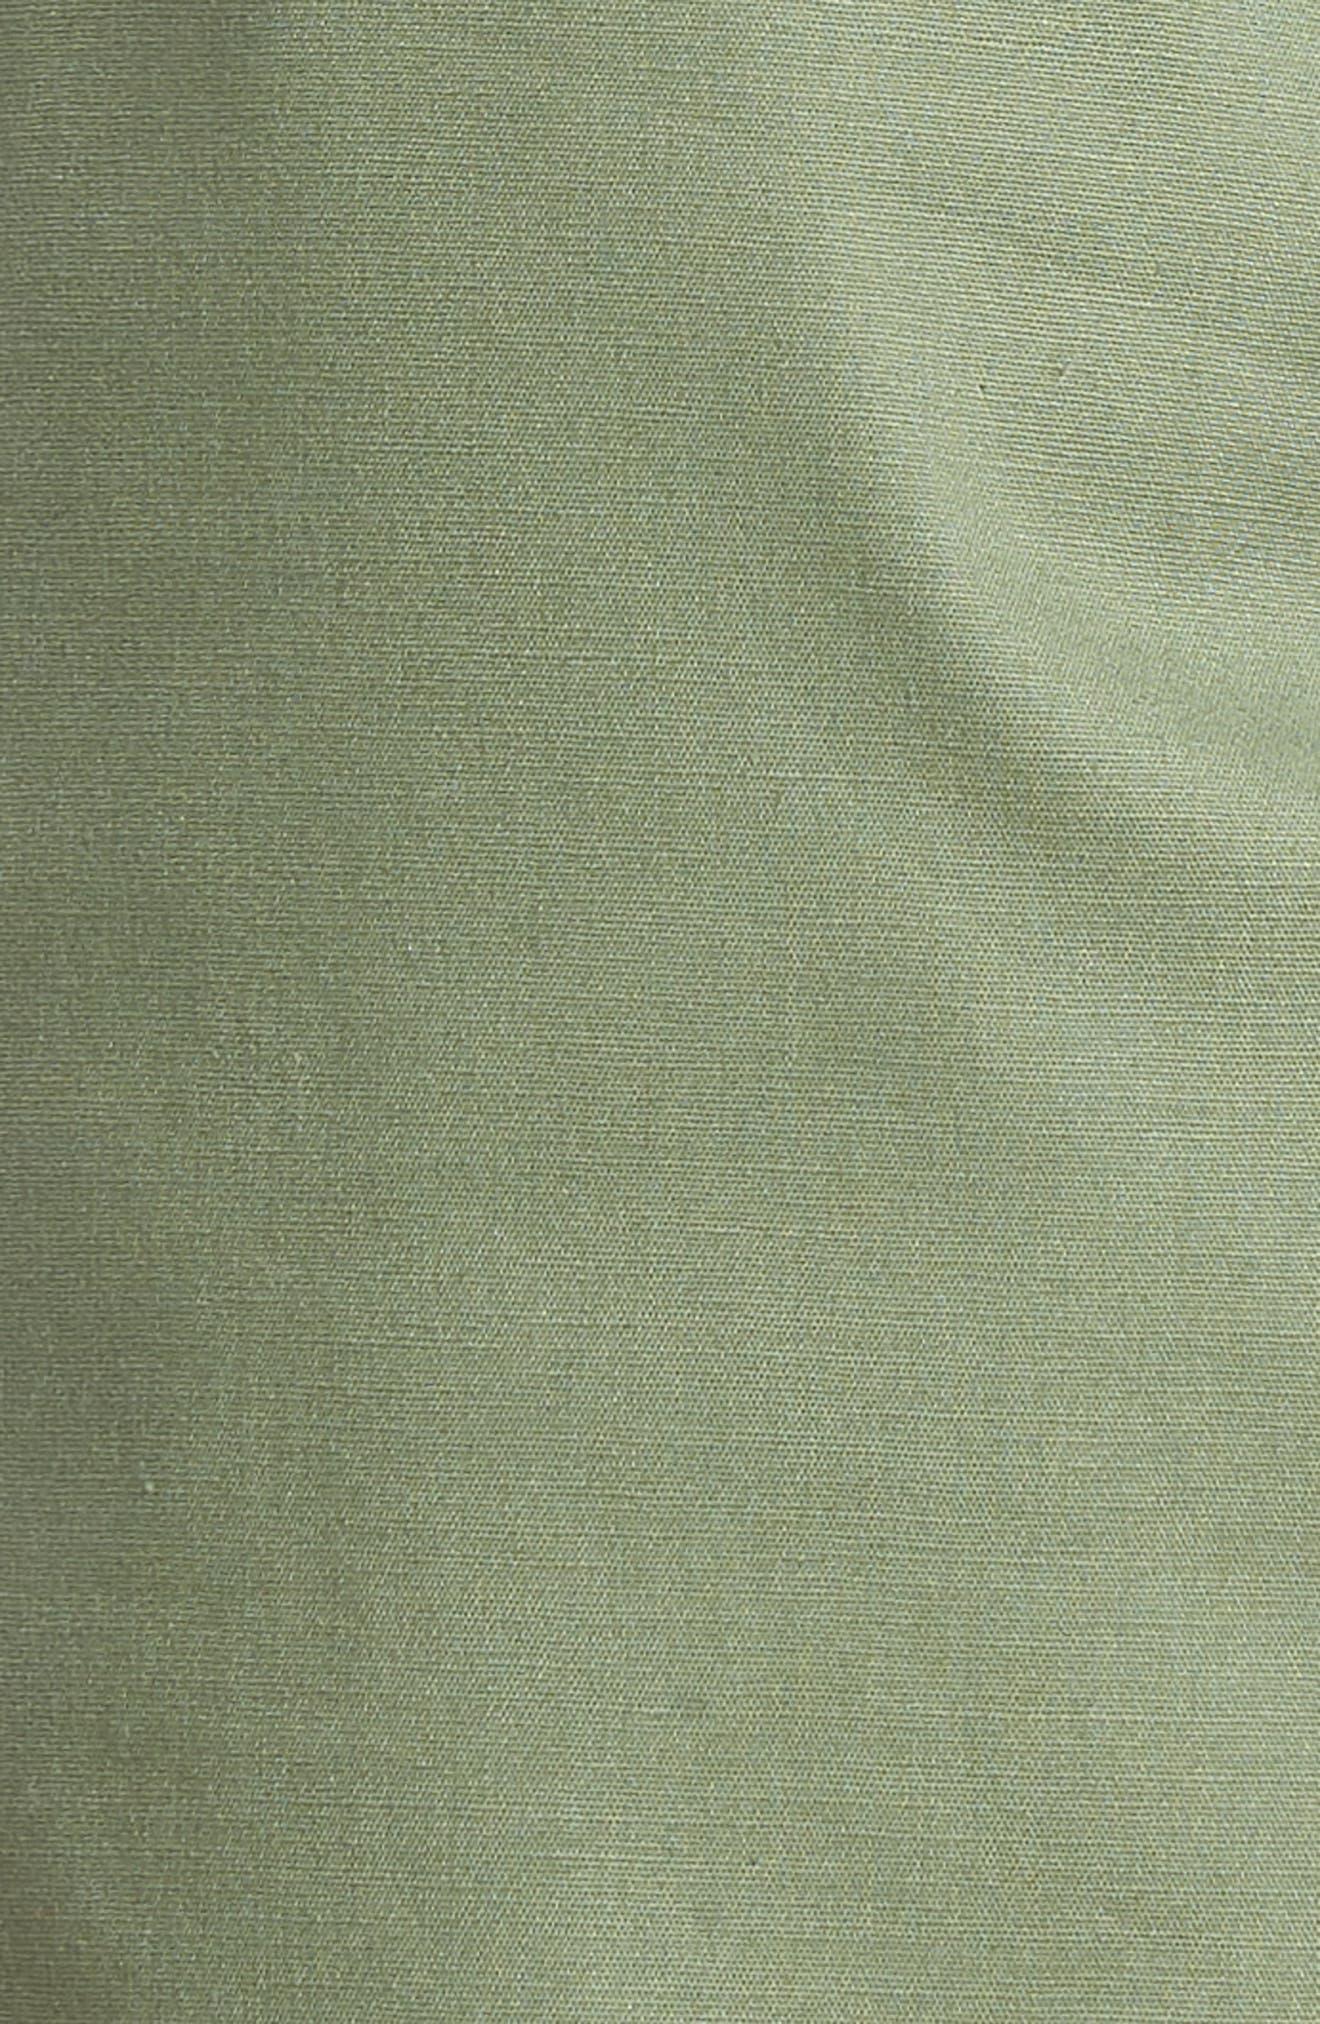 Tie Waist Scallop Hem Shorts,                             Alternate thumbnail 5, color,                             Green Bronze